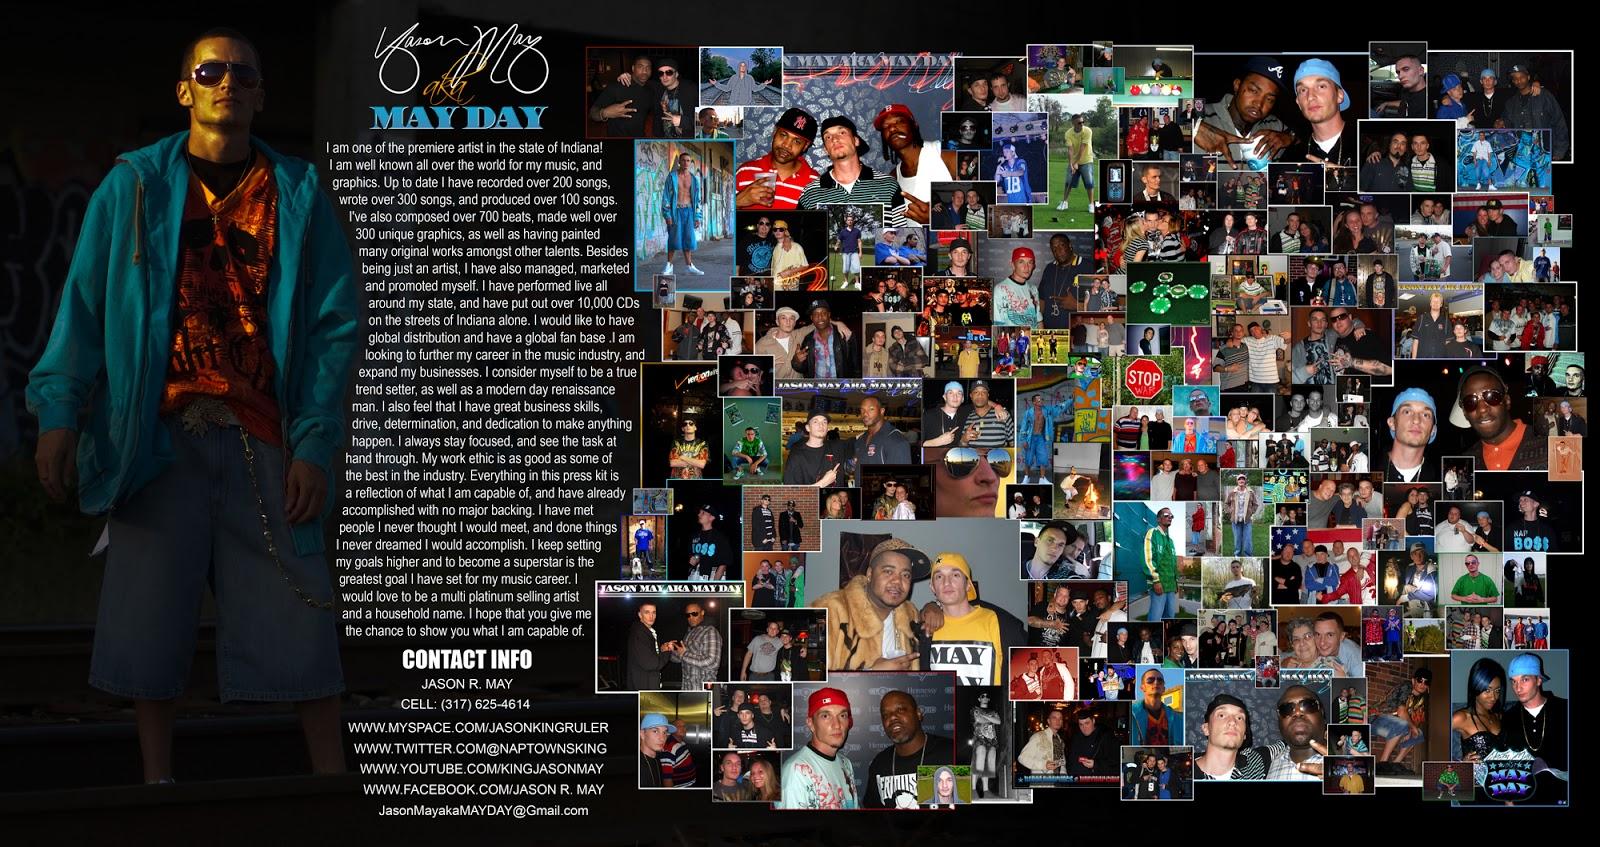 http://1.bp.blogspot.com/-_Ix-PTBlnww/UQJG3W6payI/AAAAAAAAANw/IWaN-3U259w/s1600/AMERICAN+IDOL+NICKI+MINAJ+YOUNG+MONEY.jpg